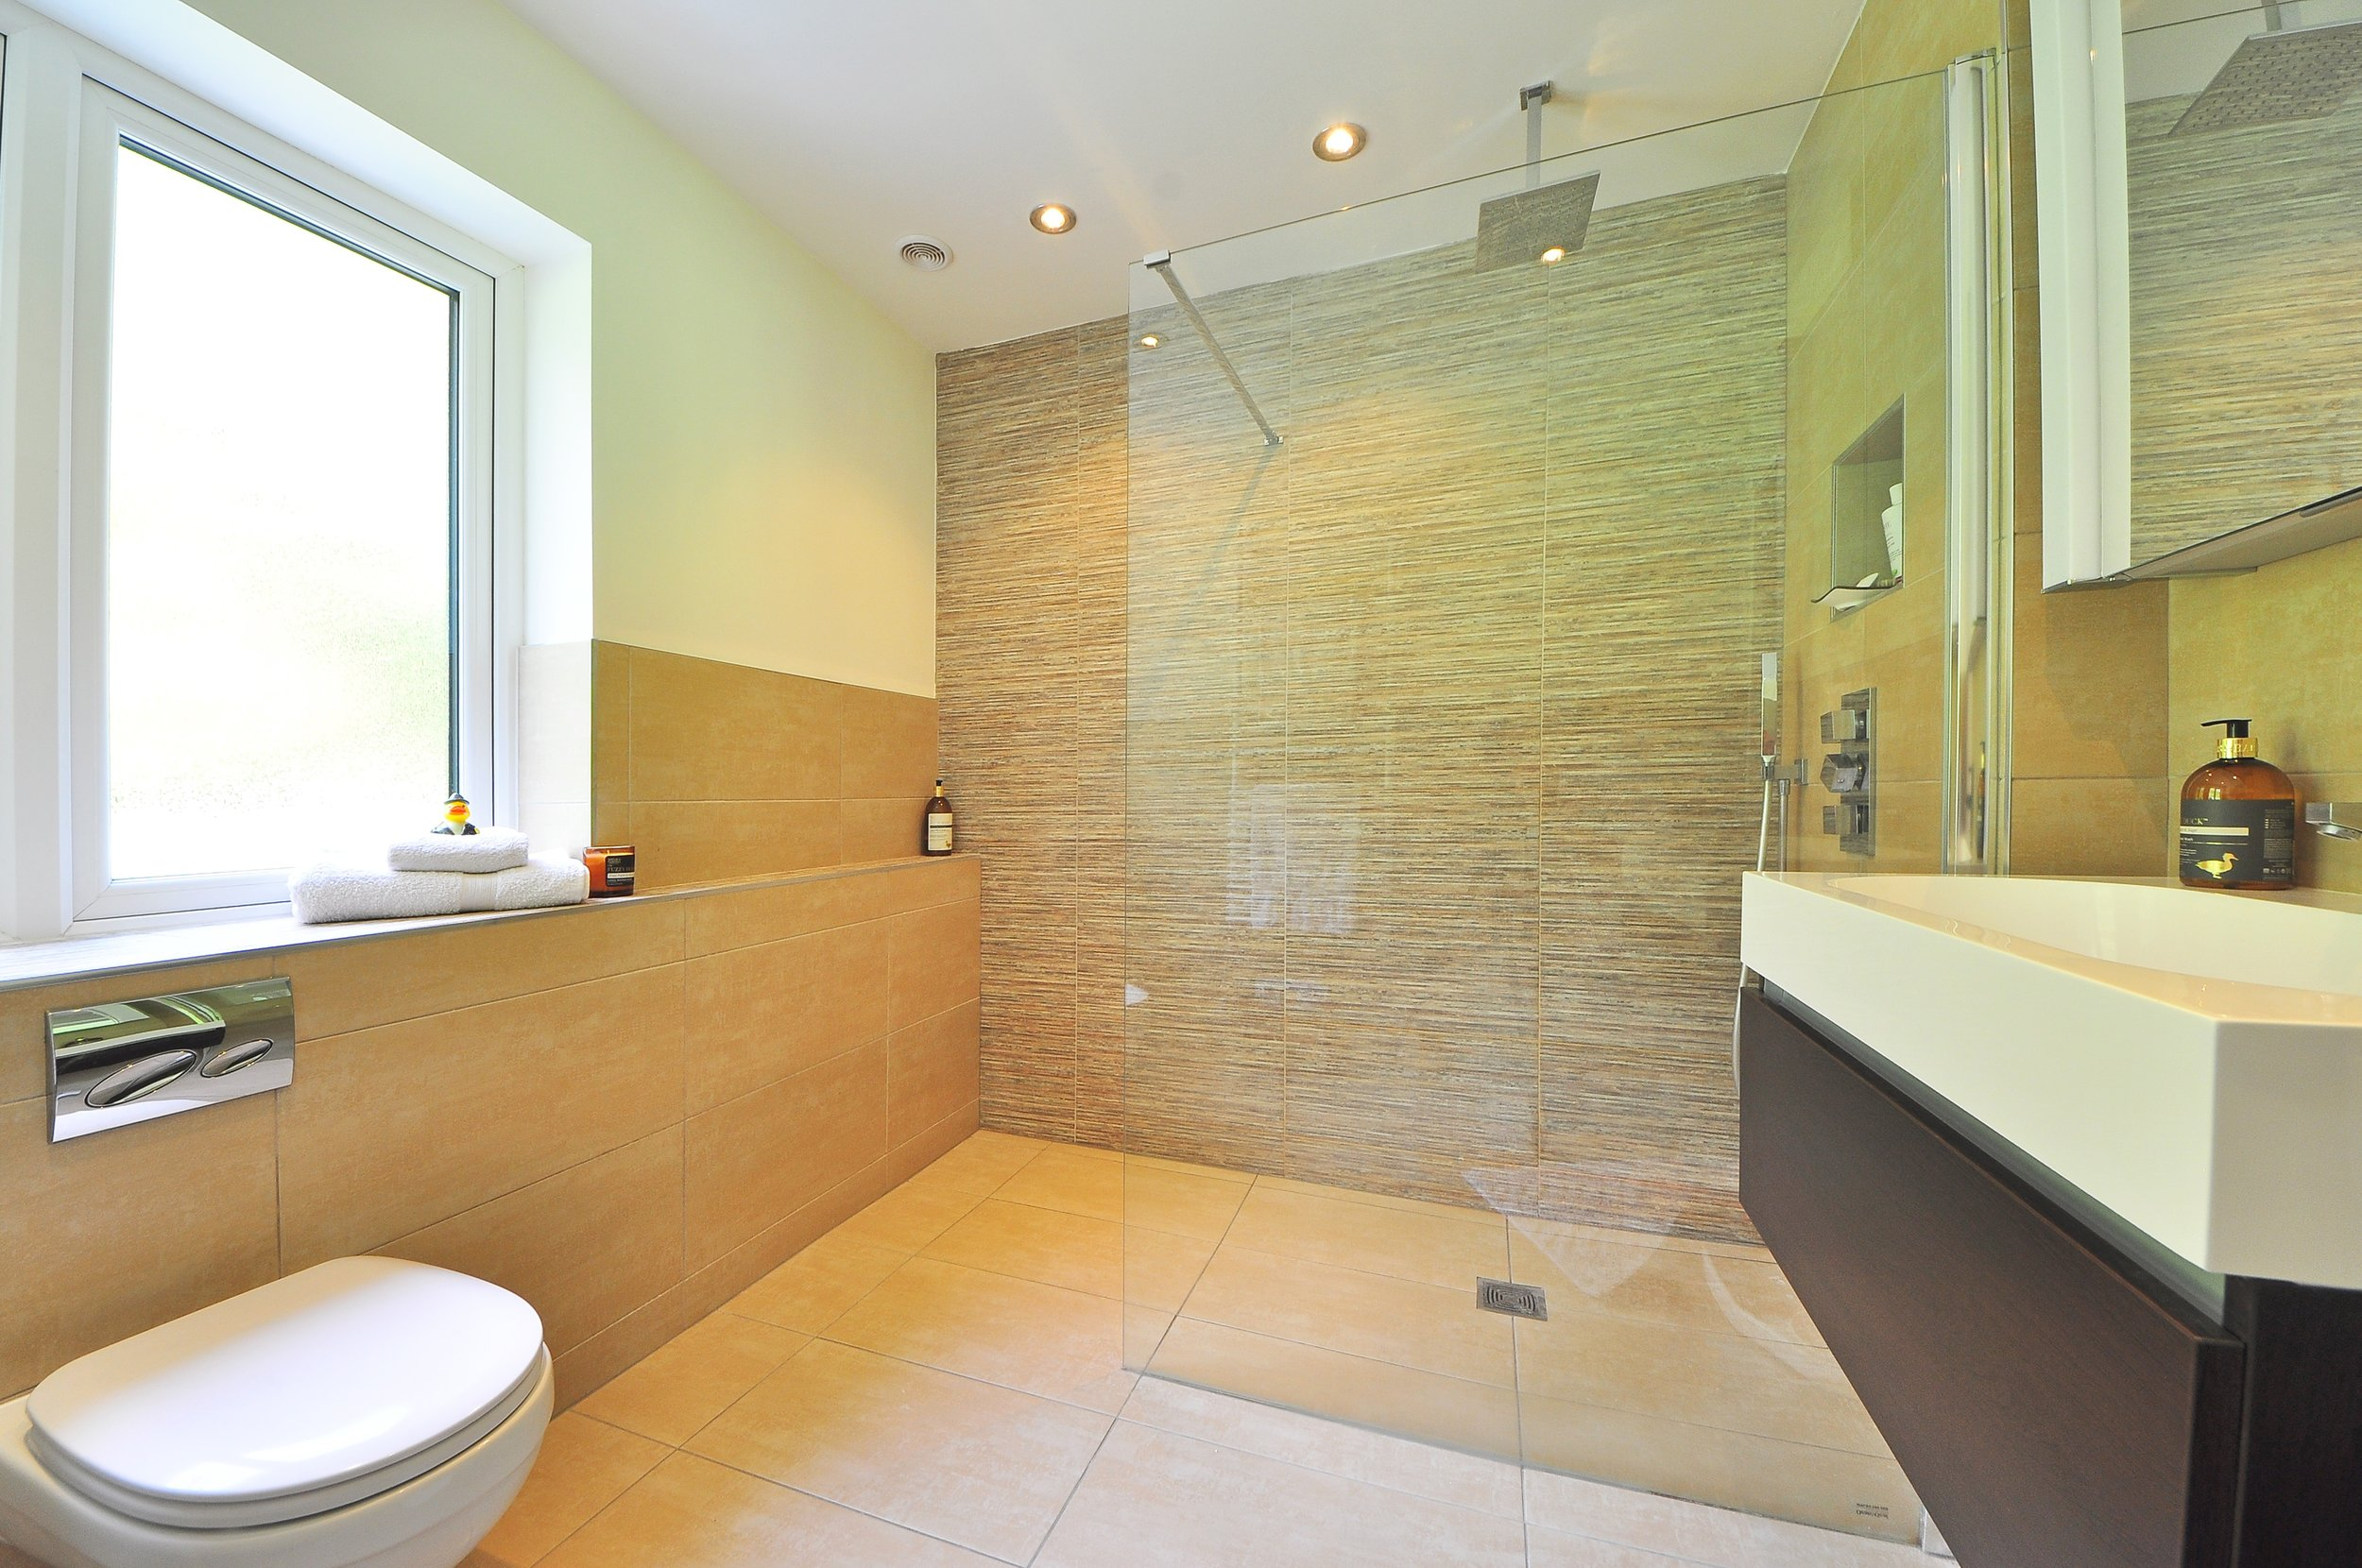 A bathroom that embraces Universal Design